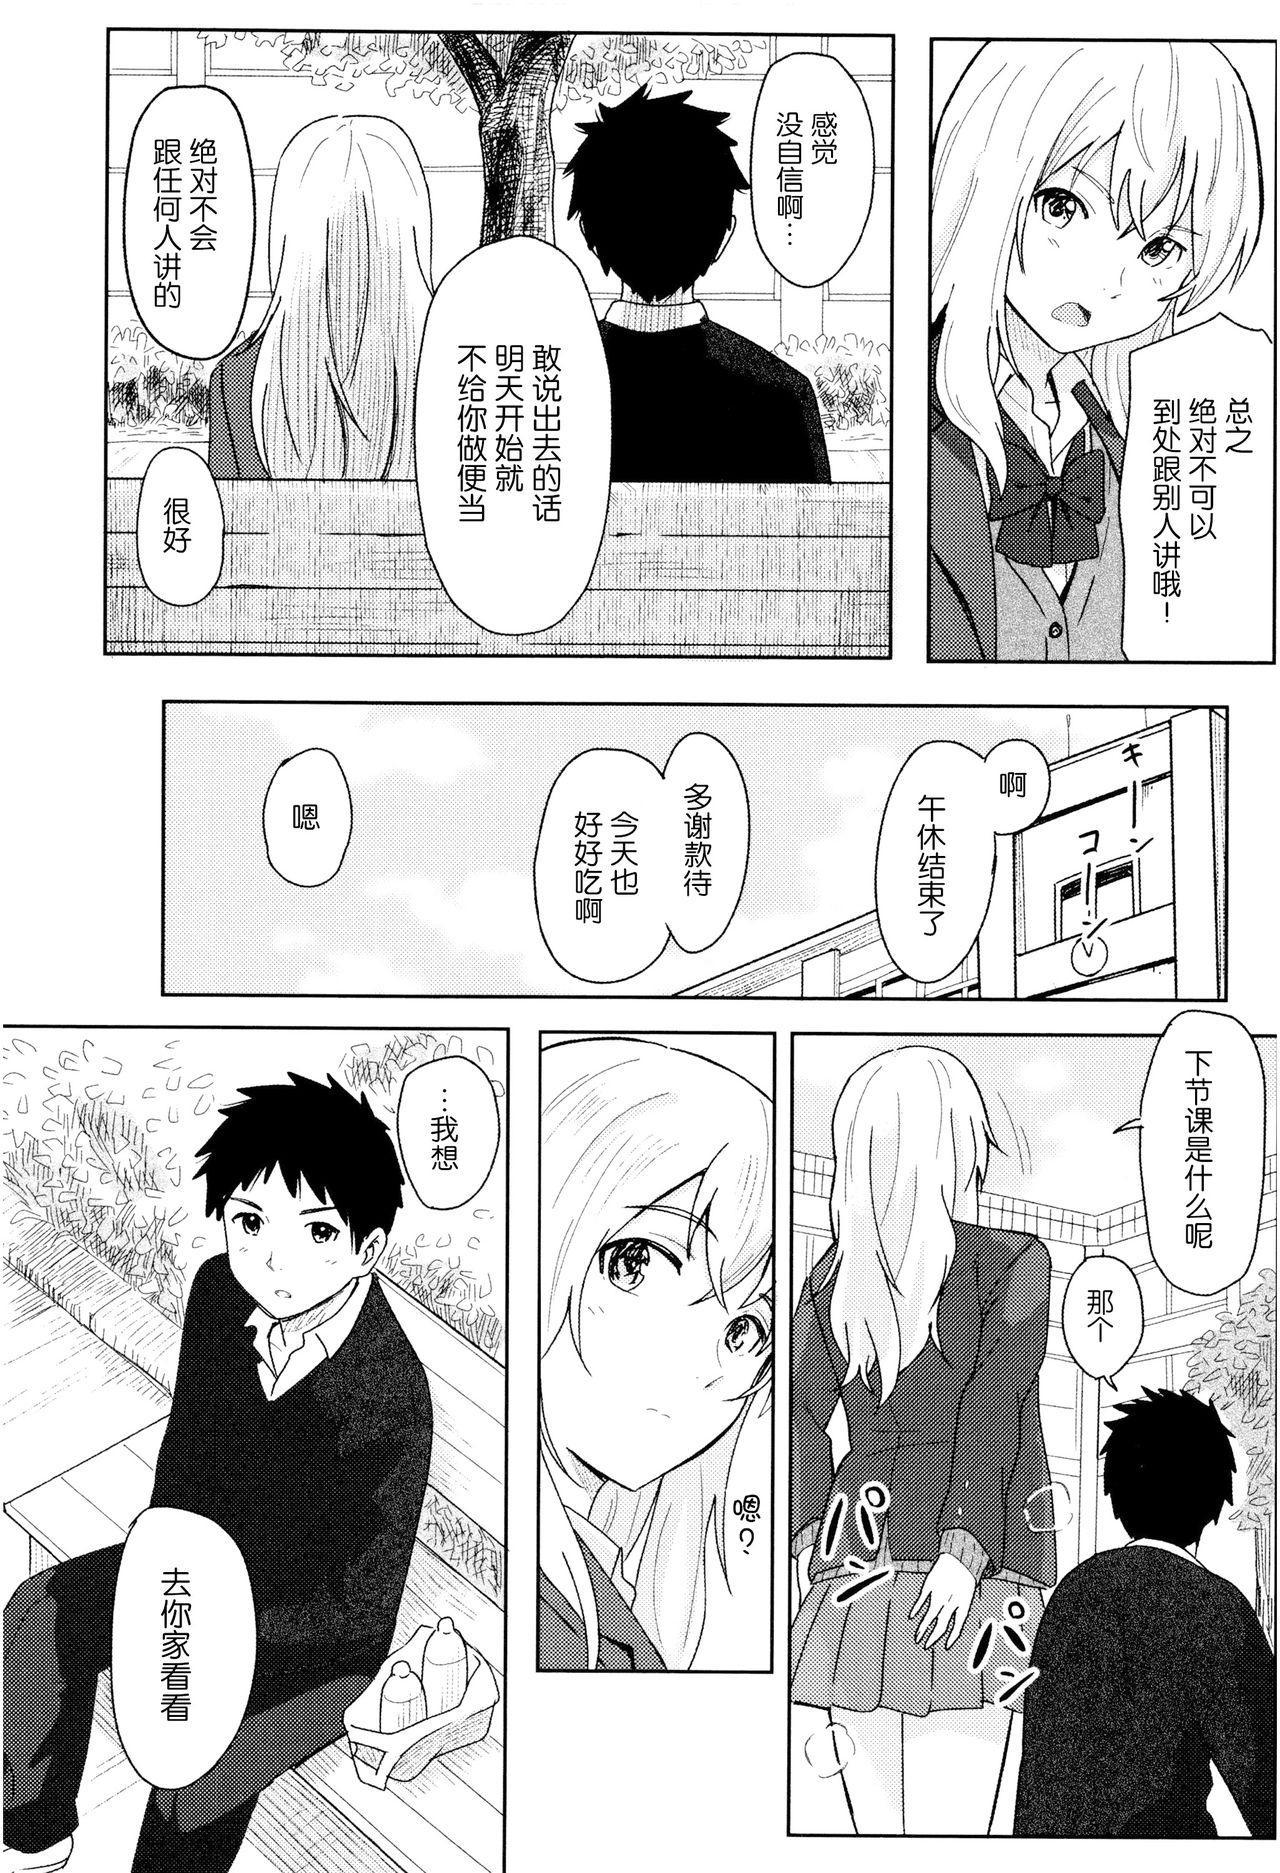 Tokubetsu na Mainichi - Special daily 12